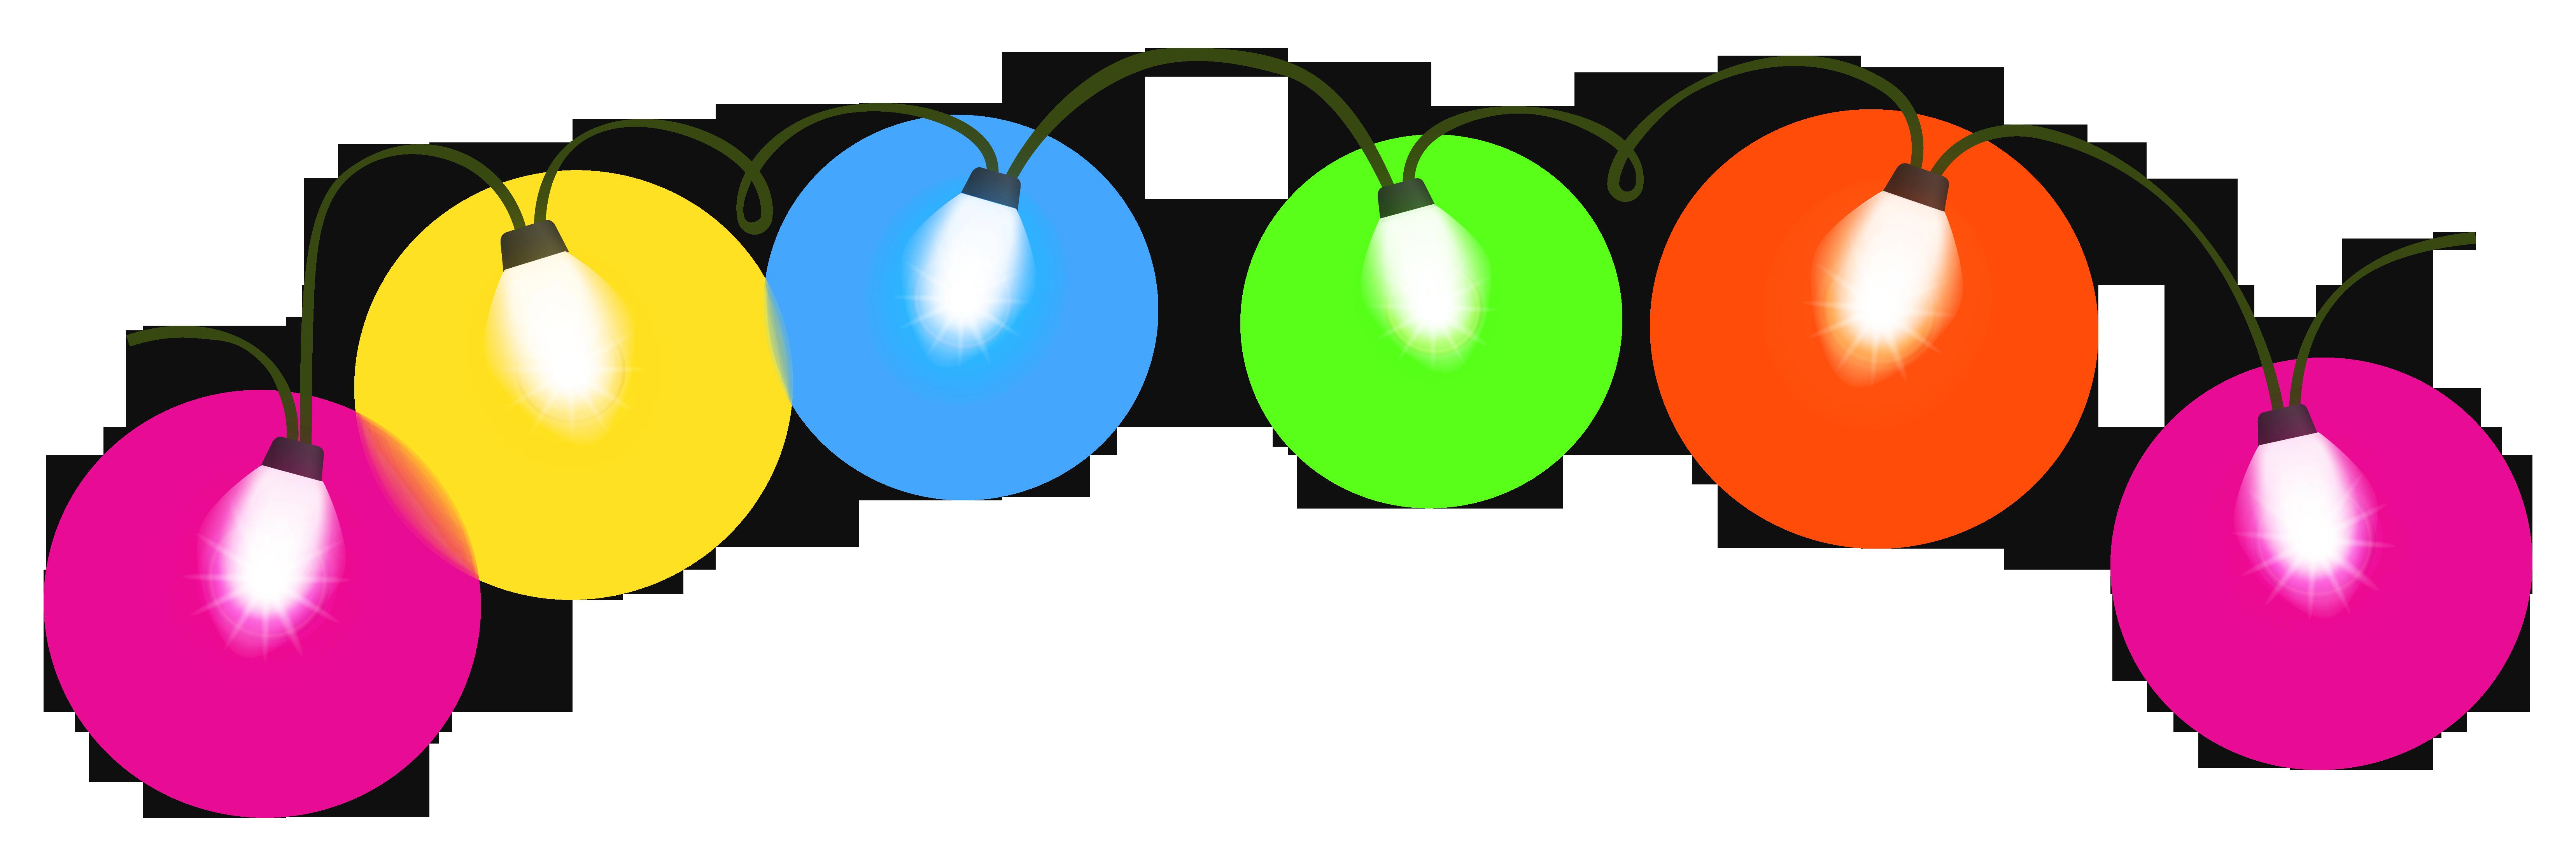 Transparent christmas lights clipart 2